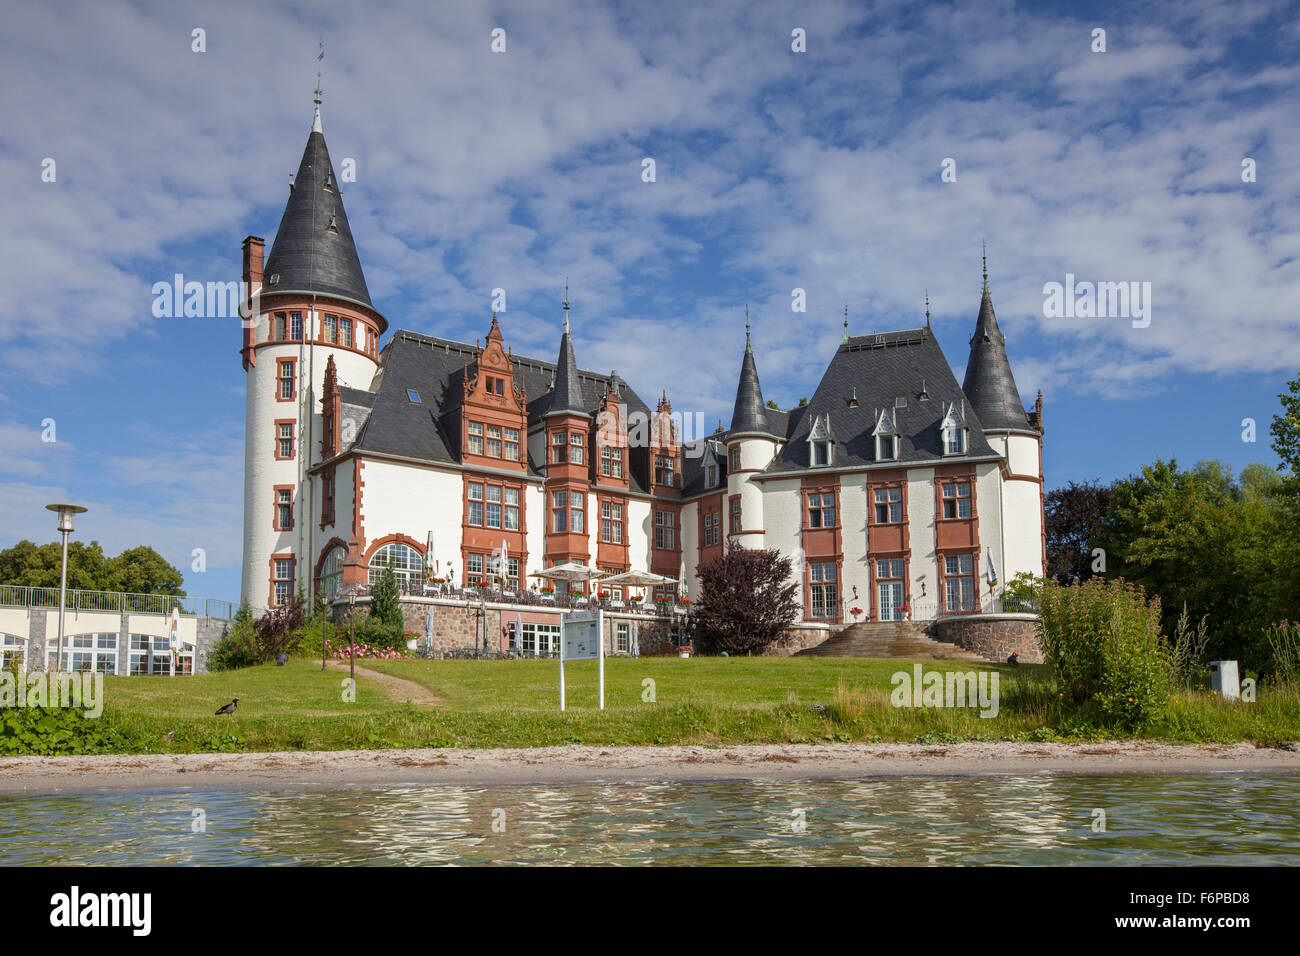 Schloss Klink, hotel at holiday resort in Müritz, Mecklenburg-West Pomerania, Germany - Stock Image